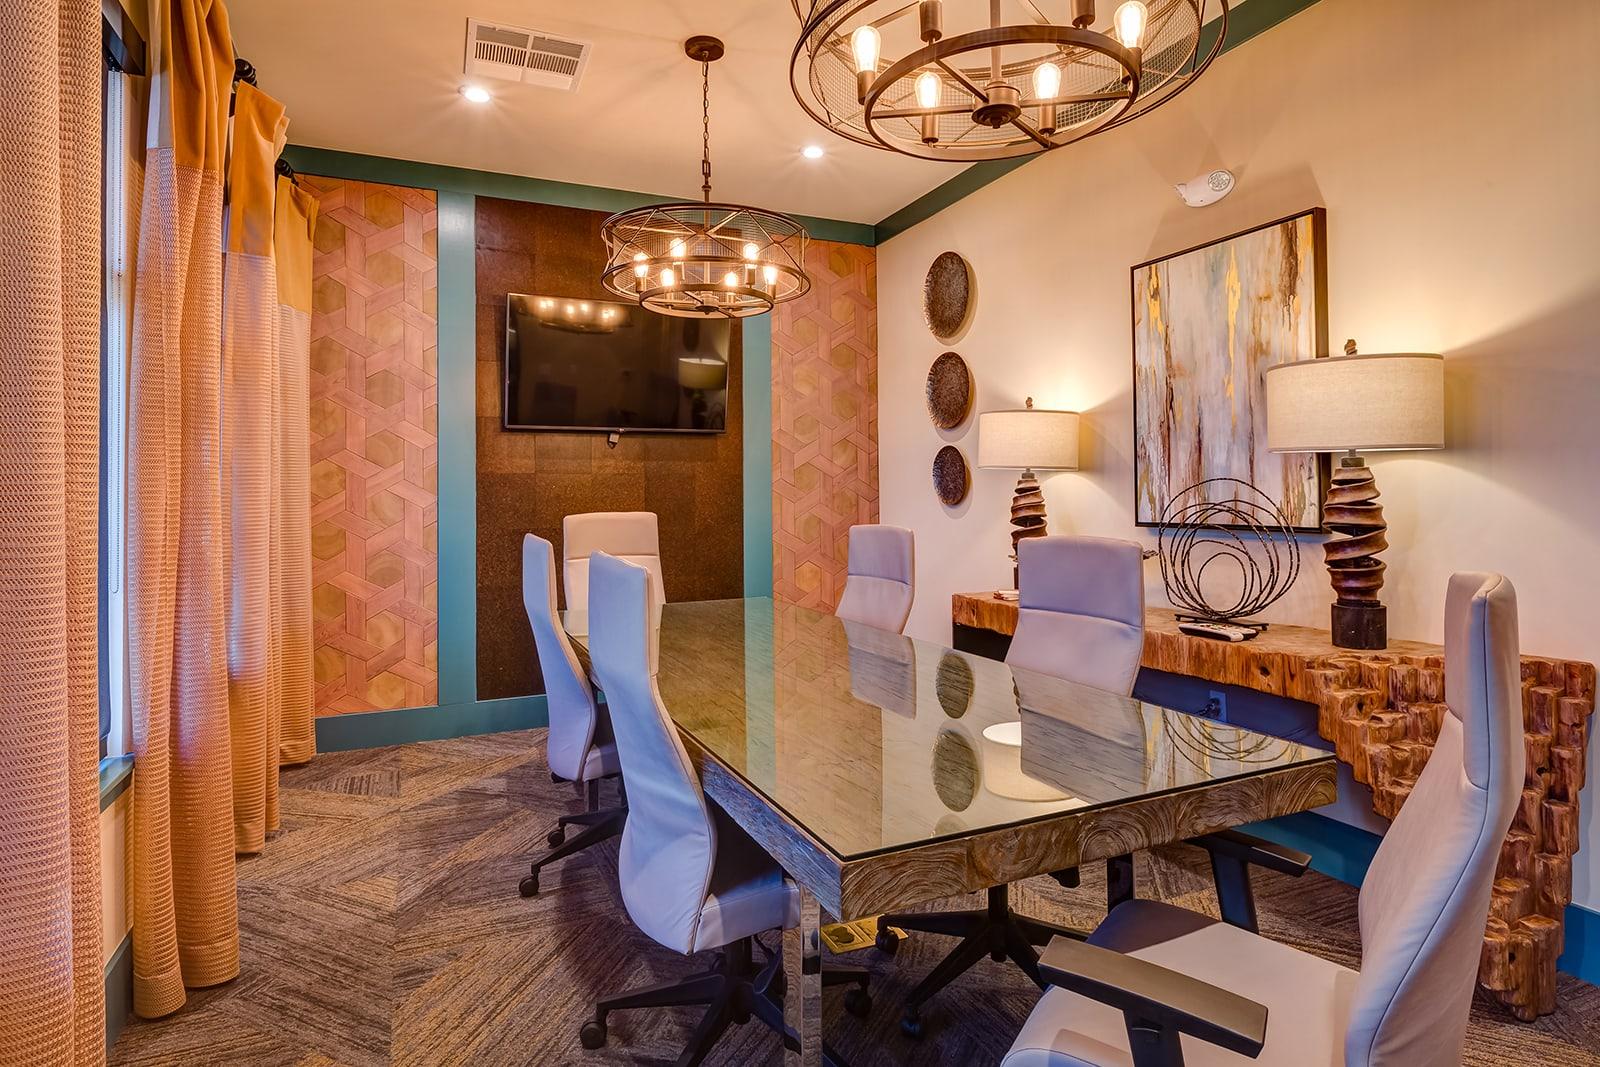 Conference Room at Windsor at Pinehurst, Colorado, 80235